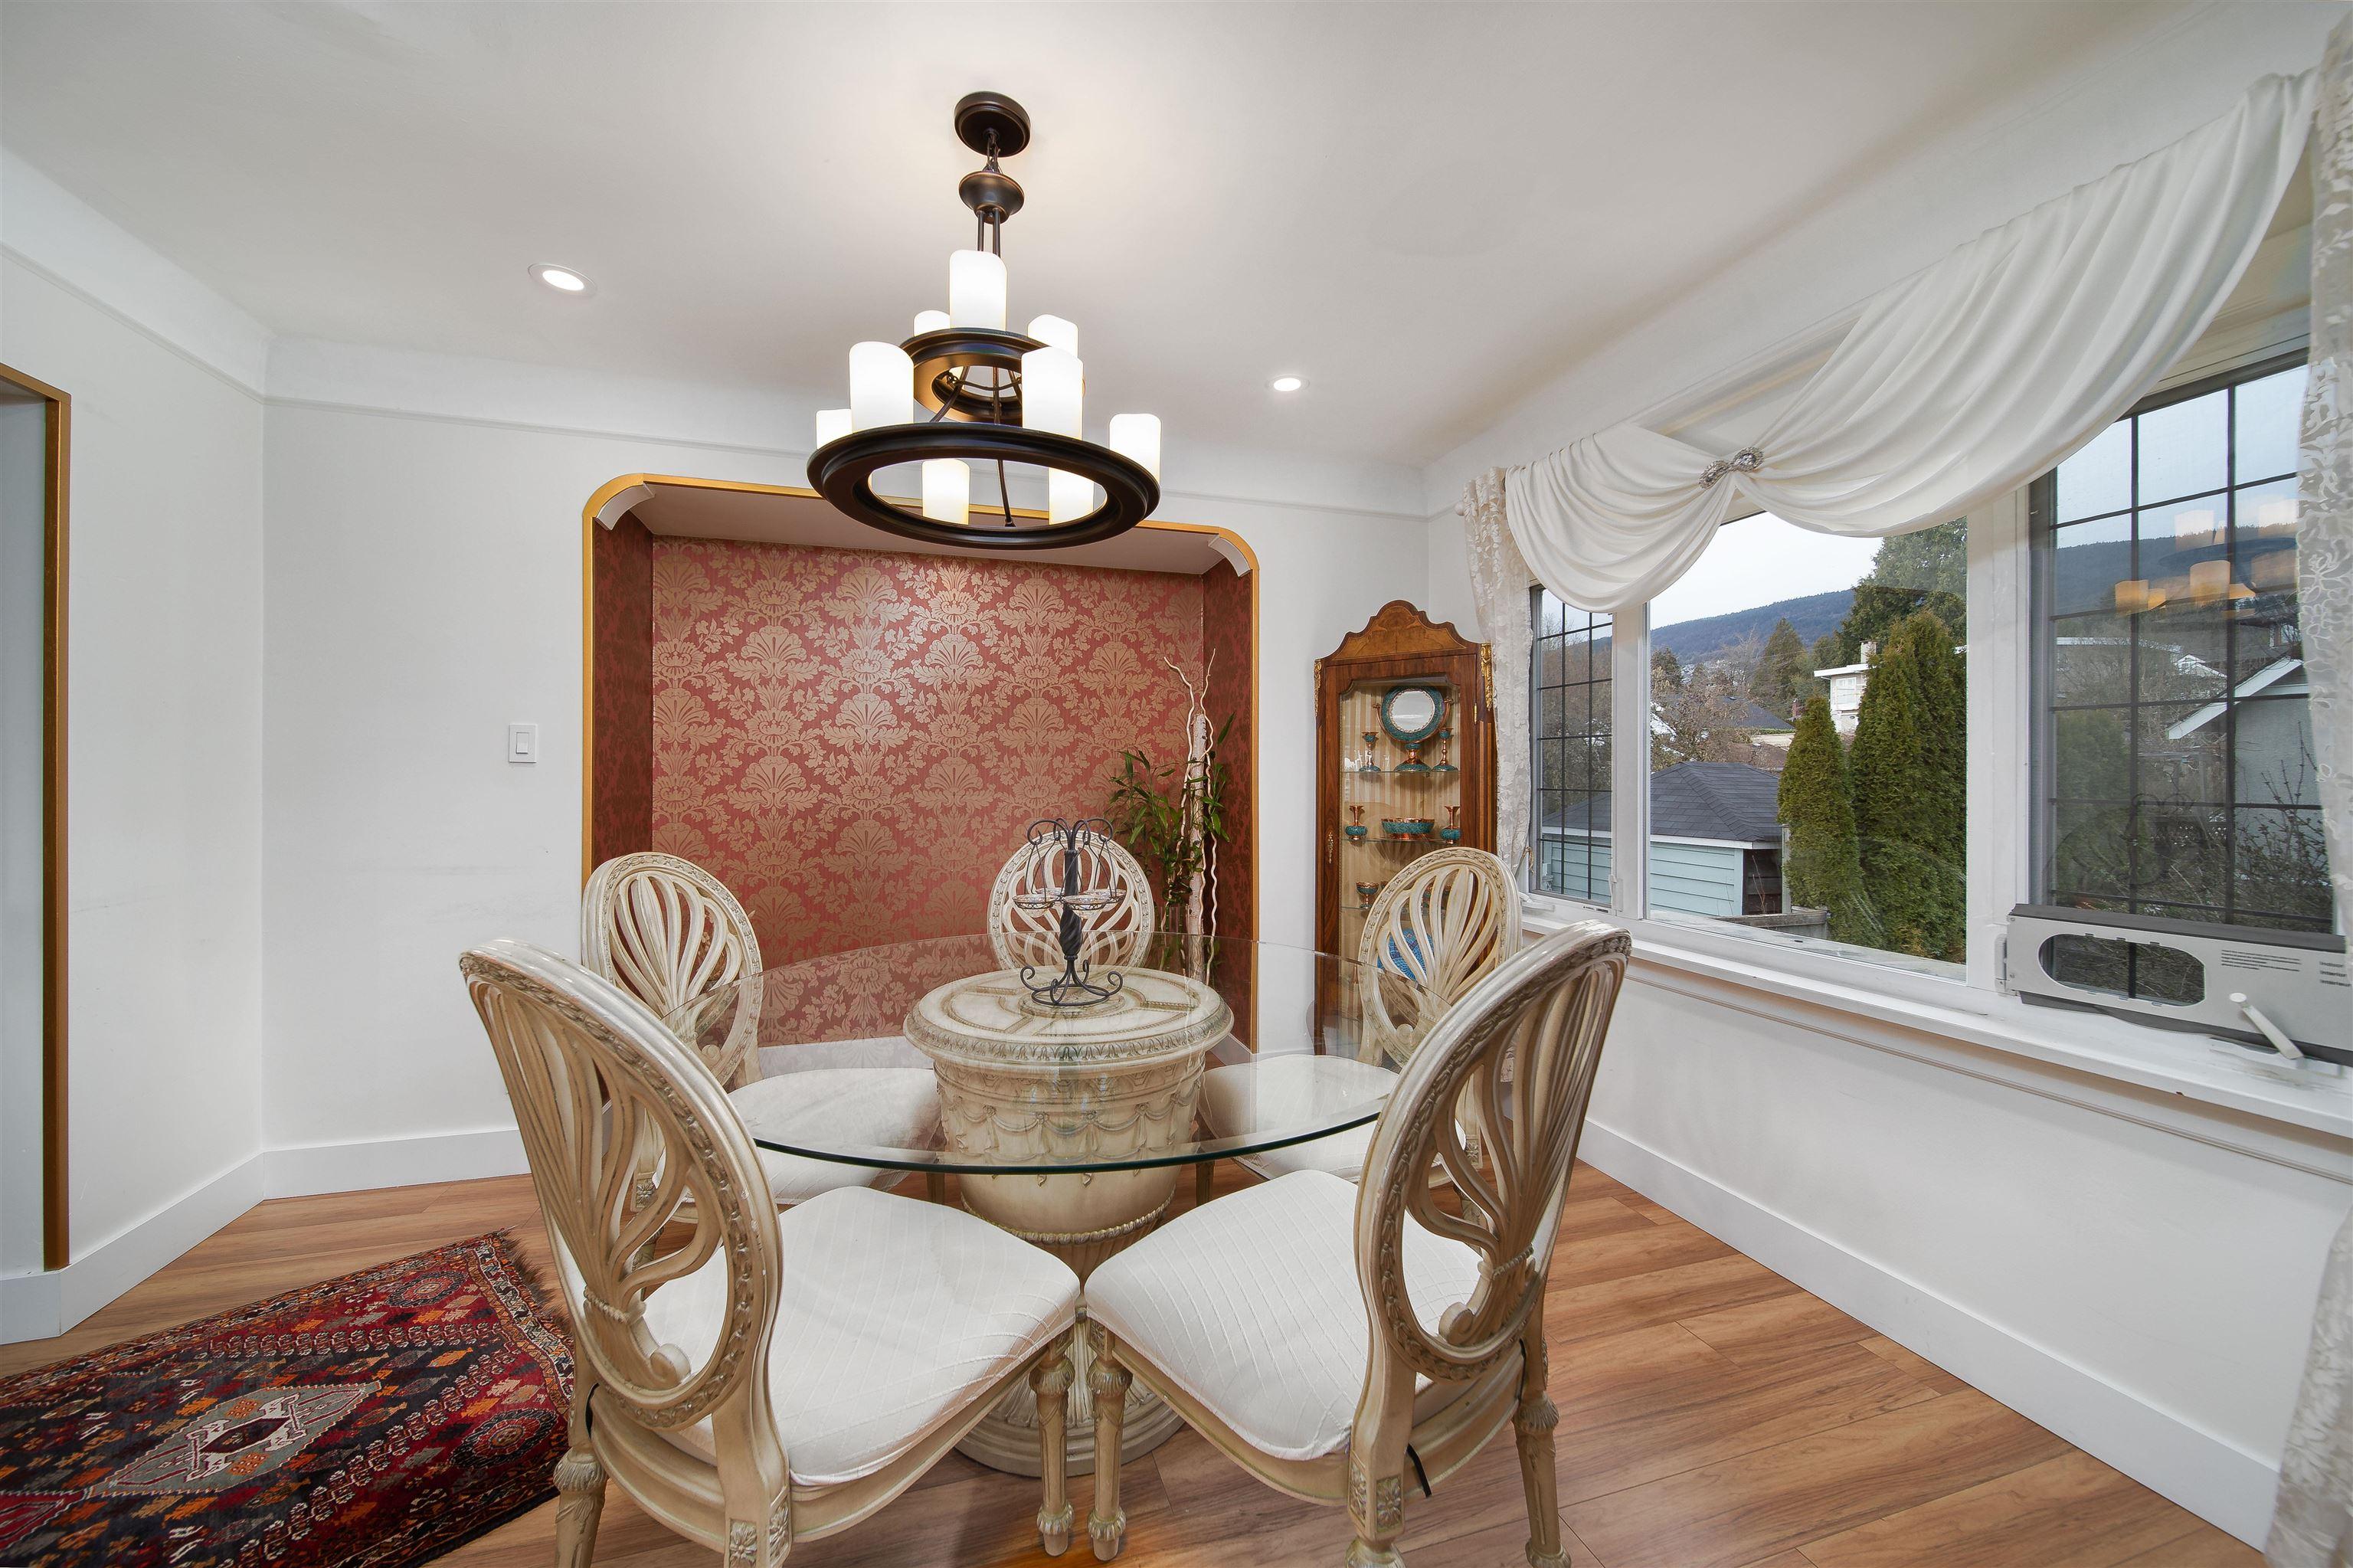 1357 FULTON AVENUE - Ambleside House/Single Family for sale, 6 Bedrooms (R2617731) - #11